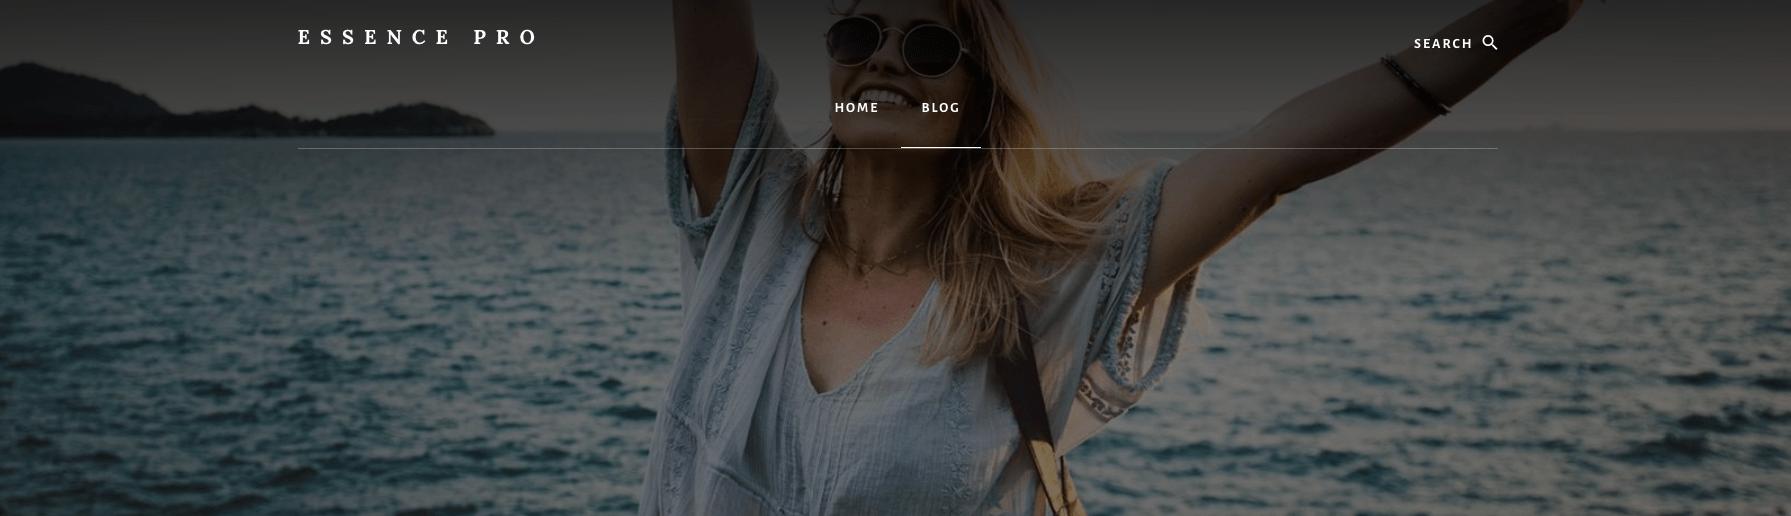 Remove Blog Page Title Essence Pro Theme